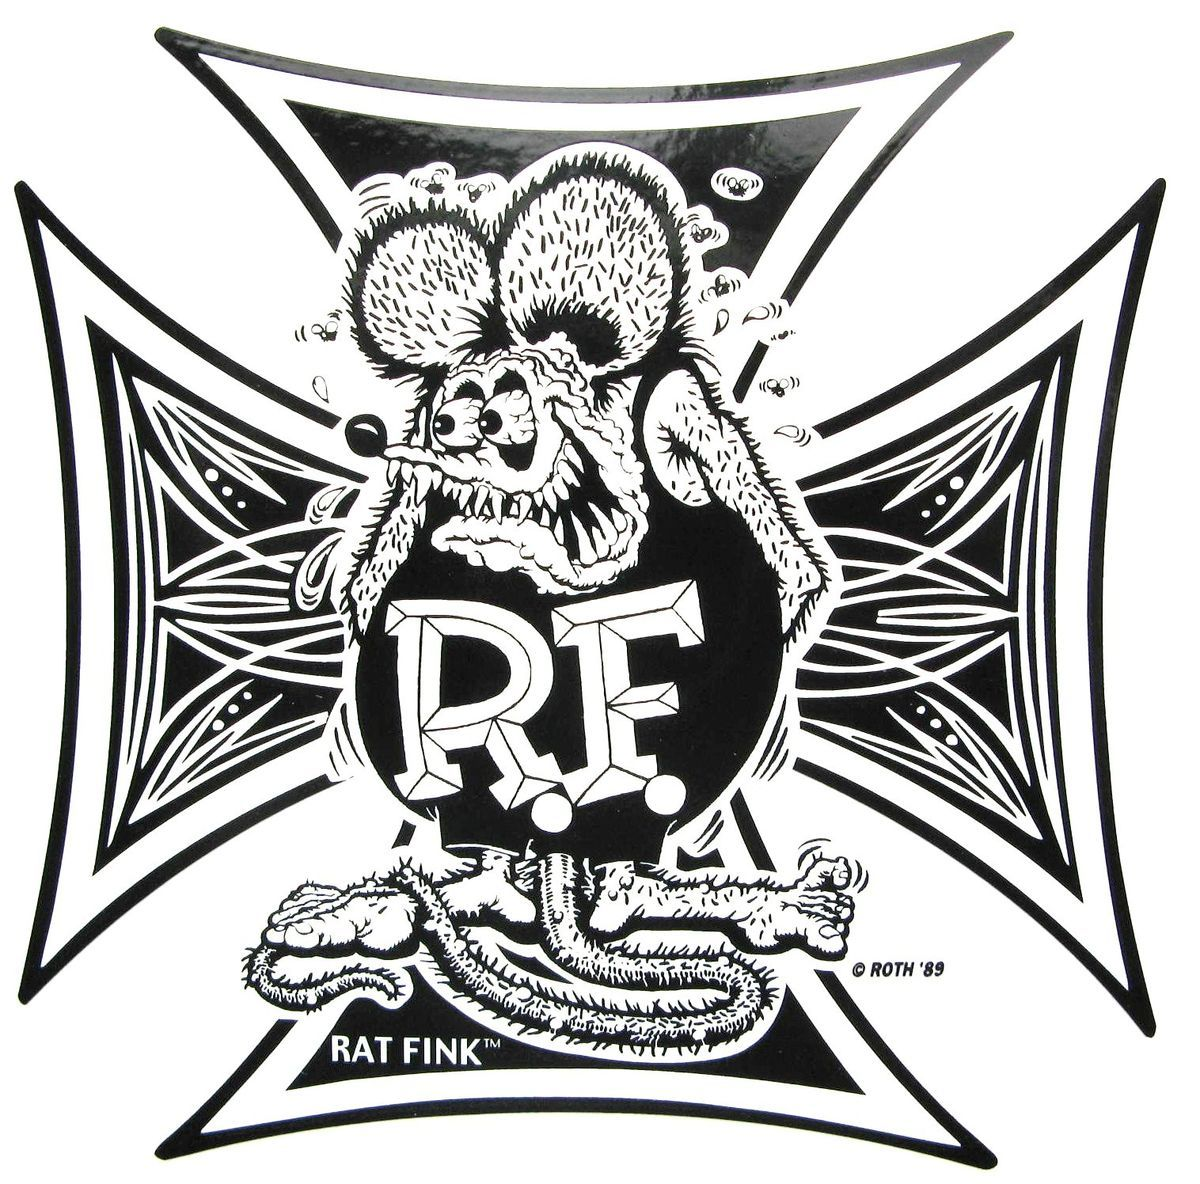 Rat Fink Iron Cross Decal Car Food Diner Hot Rat Rod Sticker Drag